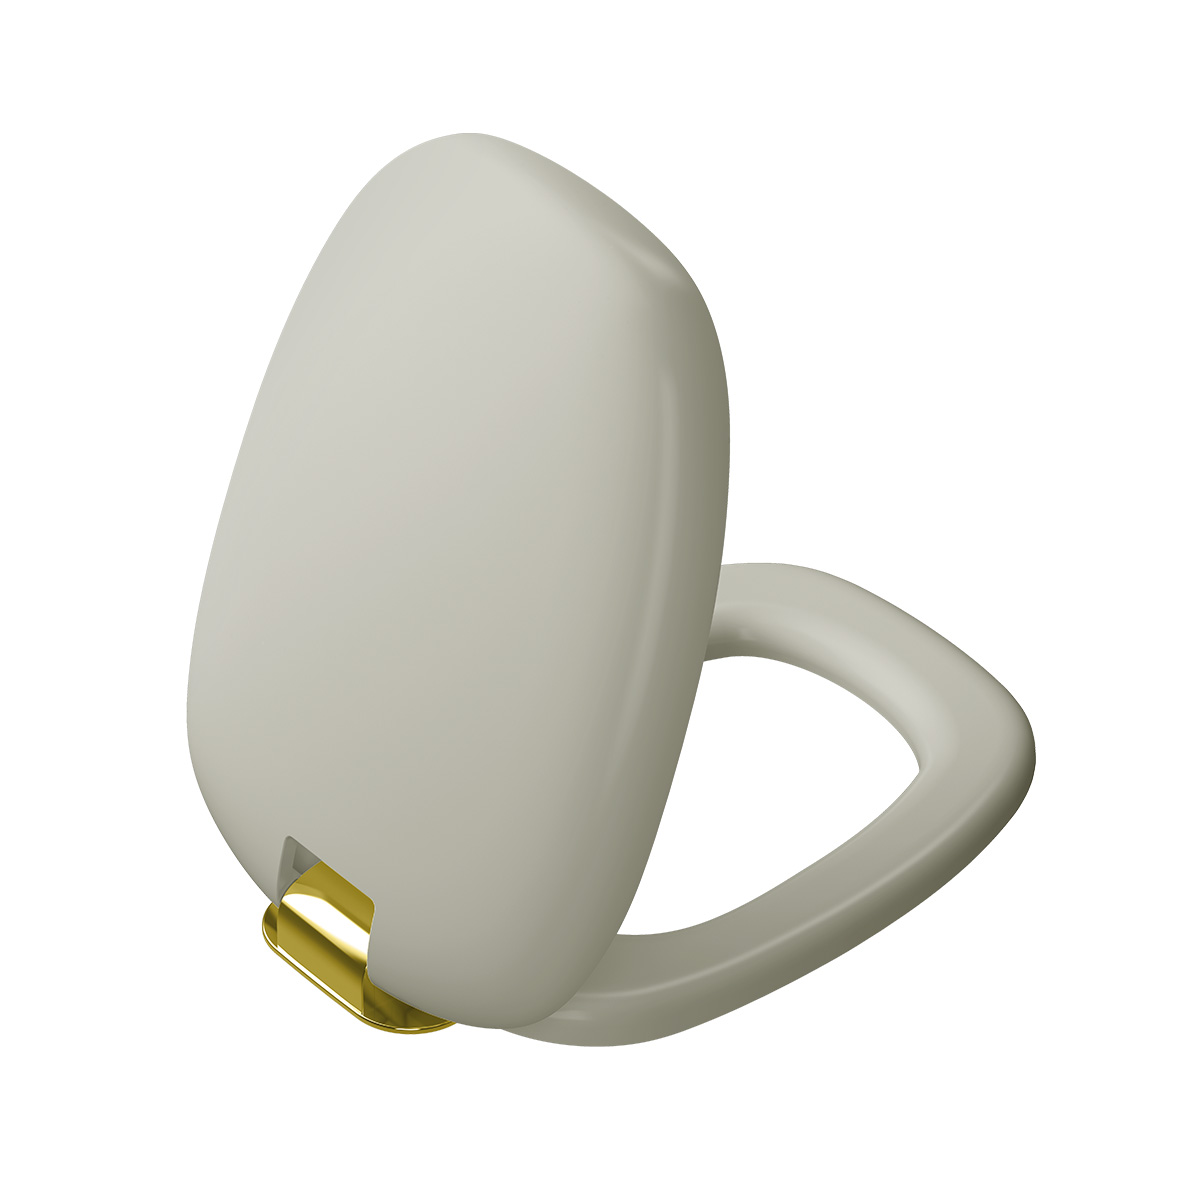 Plural WC-Sitz mit Absenkautomatik, Taupe Matt/Gold